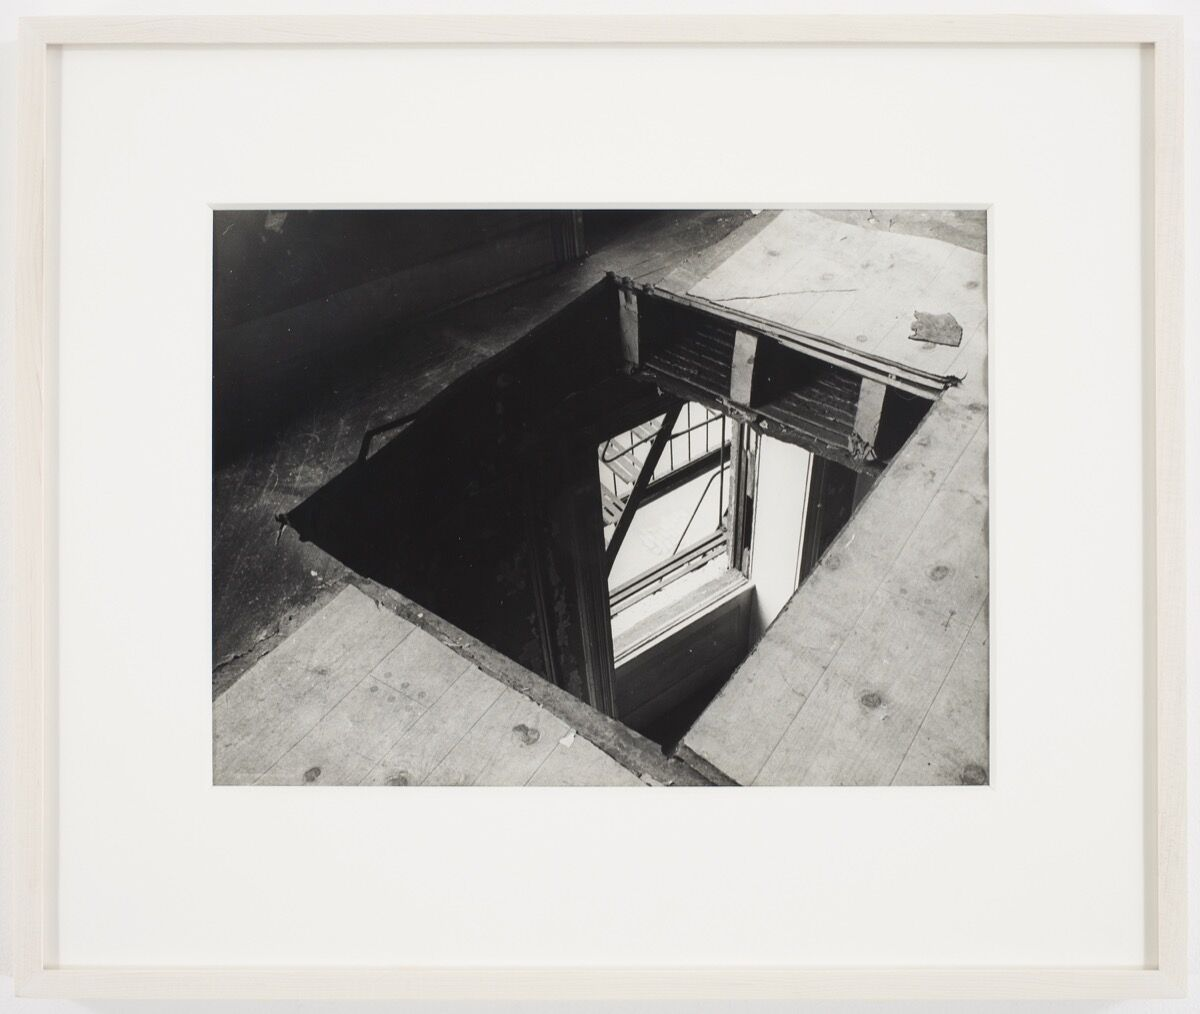 Gordon Matta-Clark, Bronx Floors, 1973. Courtesy of The Bronx Museum of the Arts.